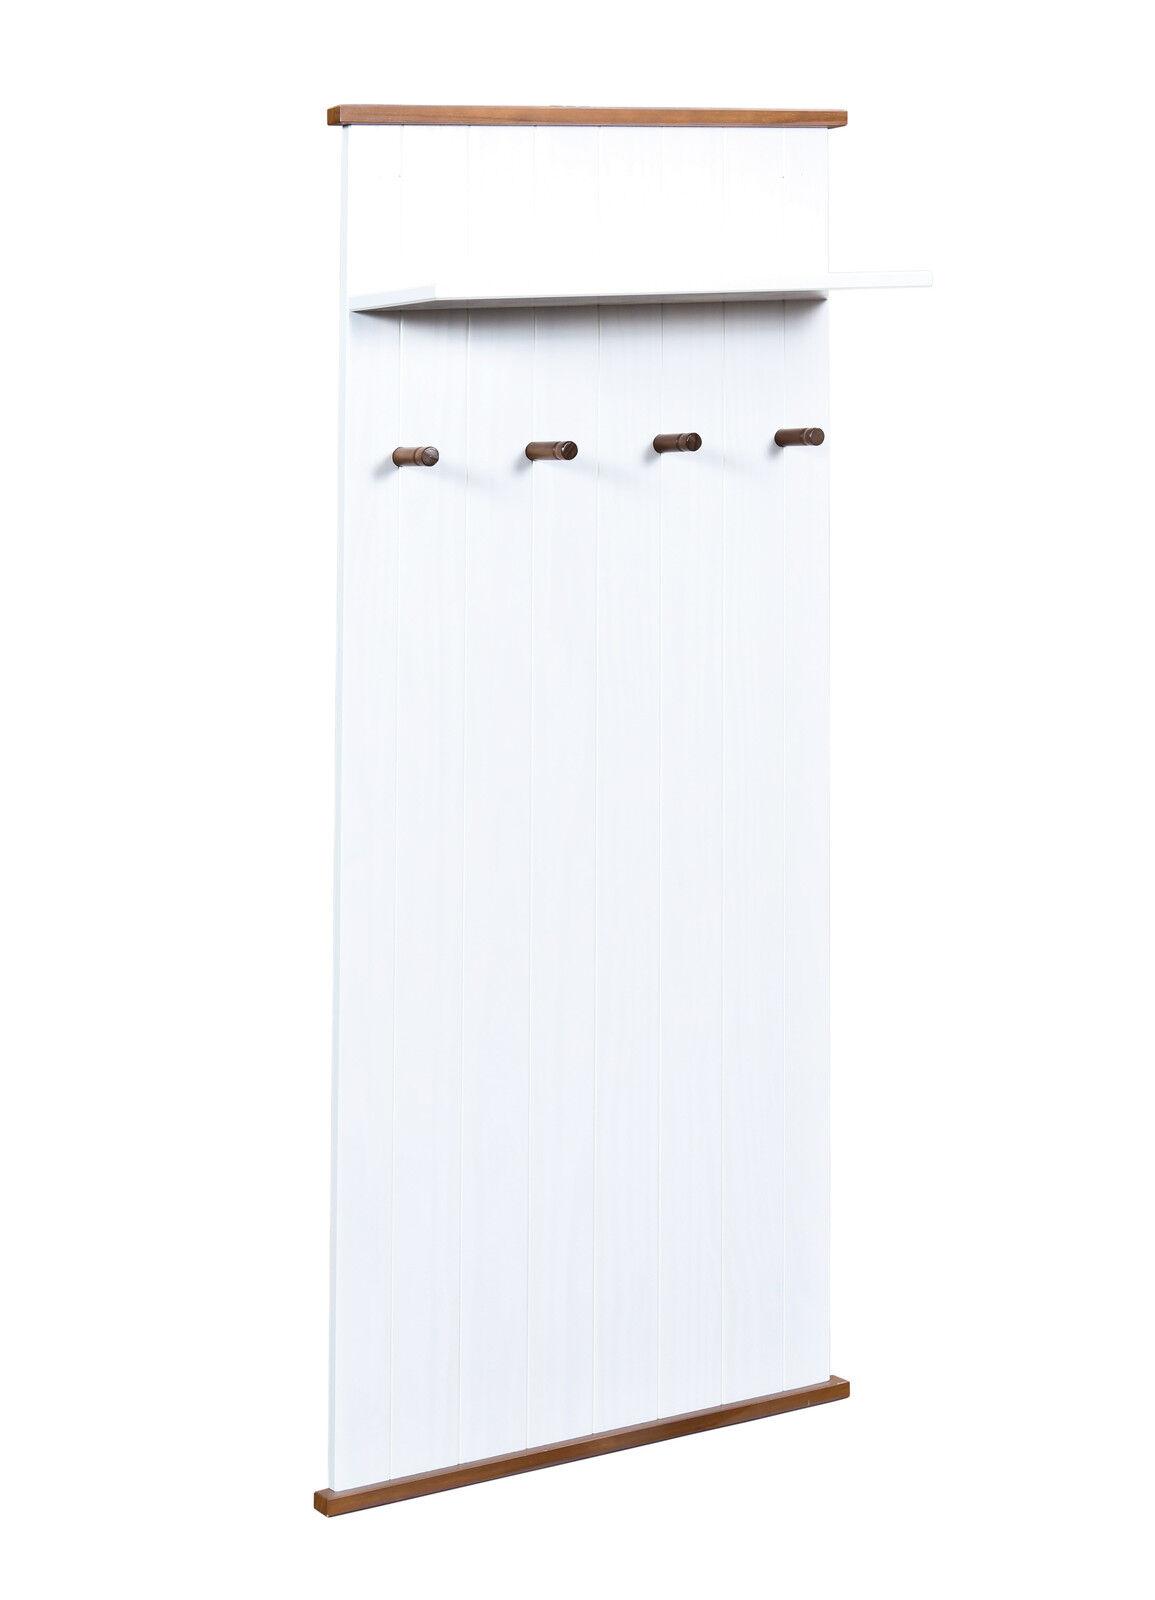 Westerland Wandpaneel 11.2, Wandgarderobe, Paneel, Kleiderpaneel, Weiß | | | New Style  a04e16